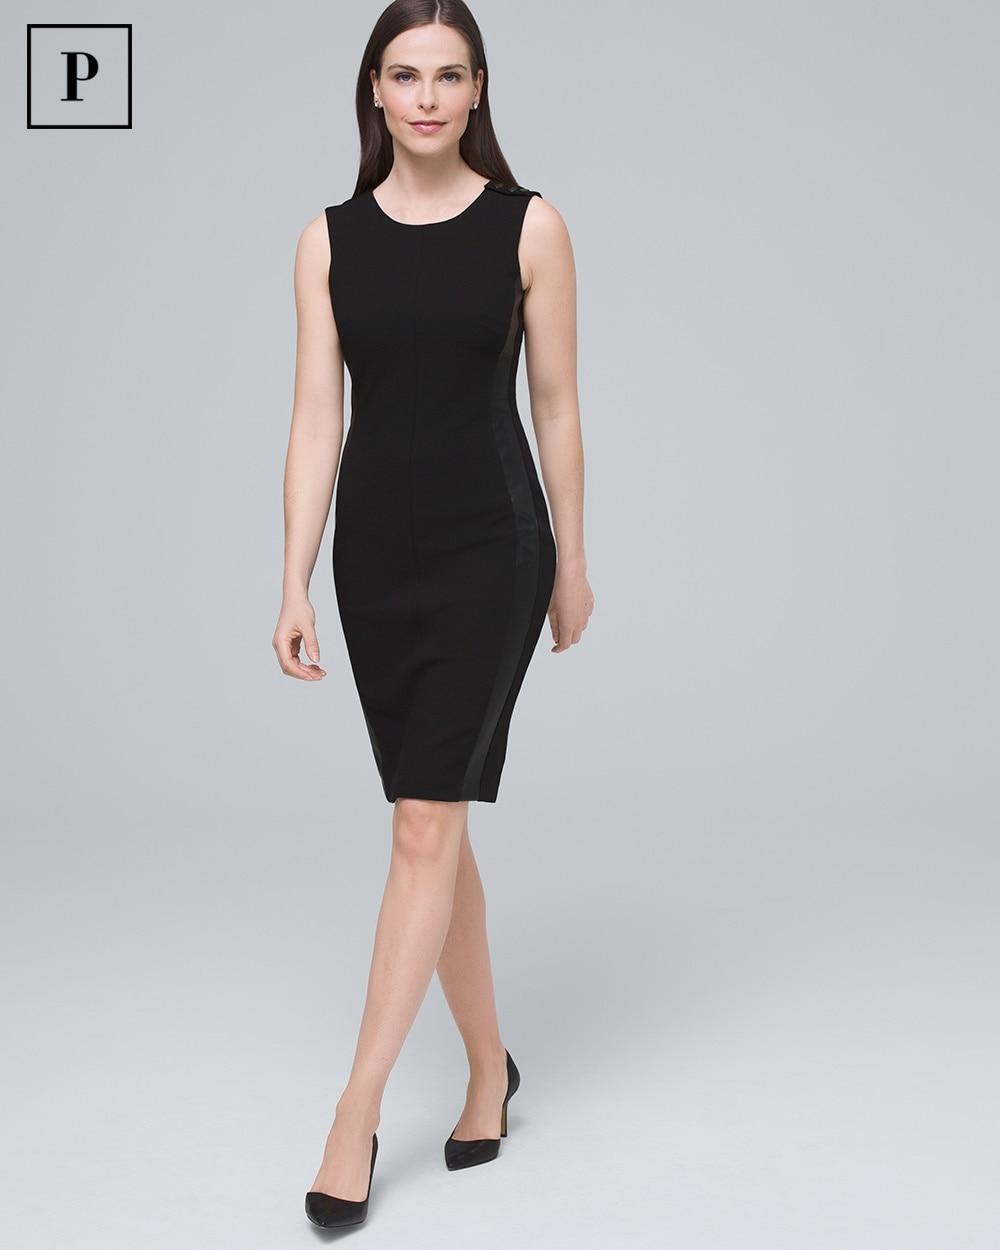 Petite Body Perfecting Faux Leather Trim Sheath Dress by Whbm